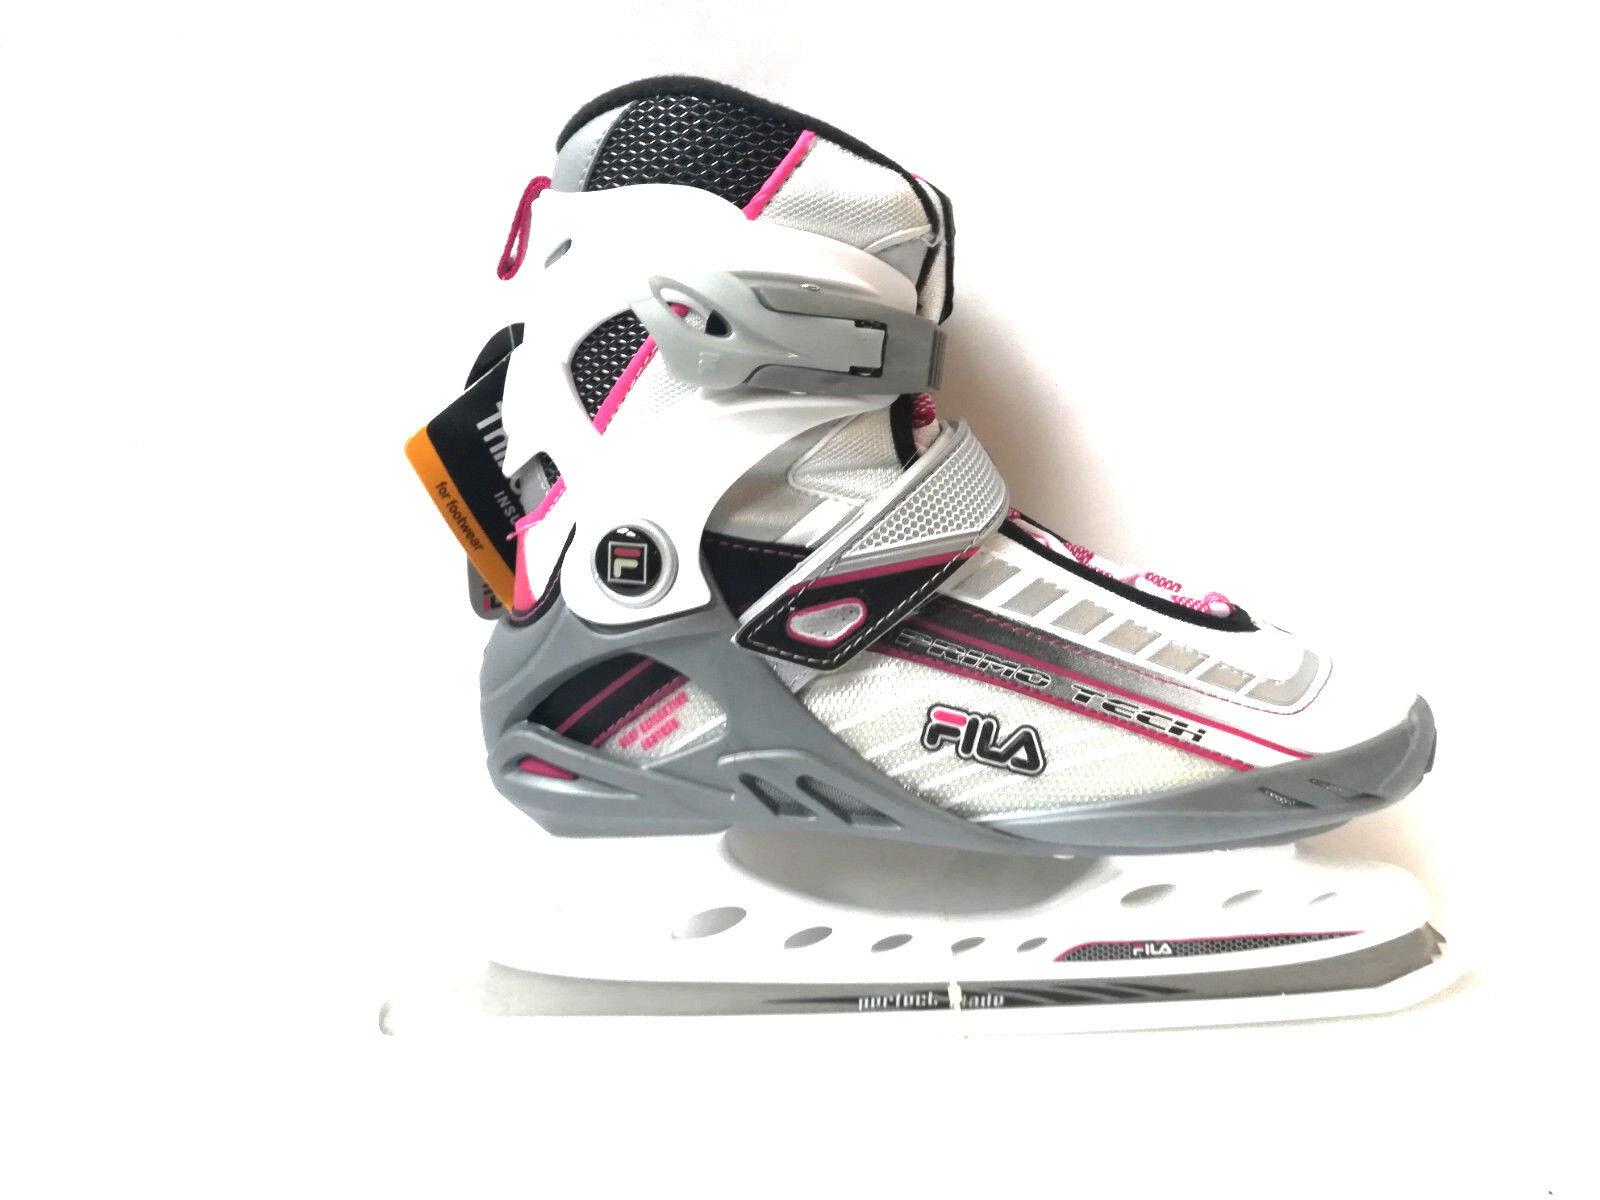 Fila Primo Tech Tech Tech Lady silber Schlittschuh Eislaufen SoftStiefel Gr. 37 Ice Skate 2e9324